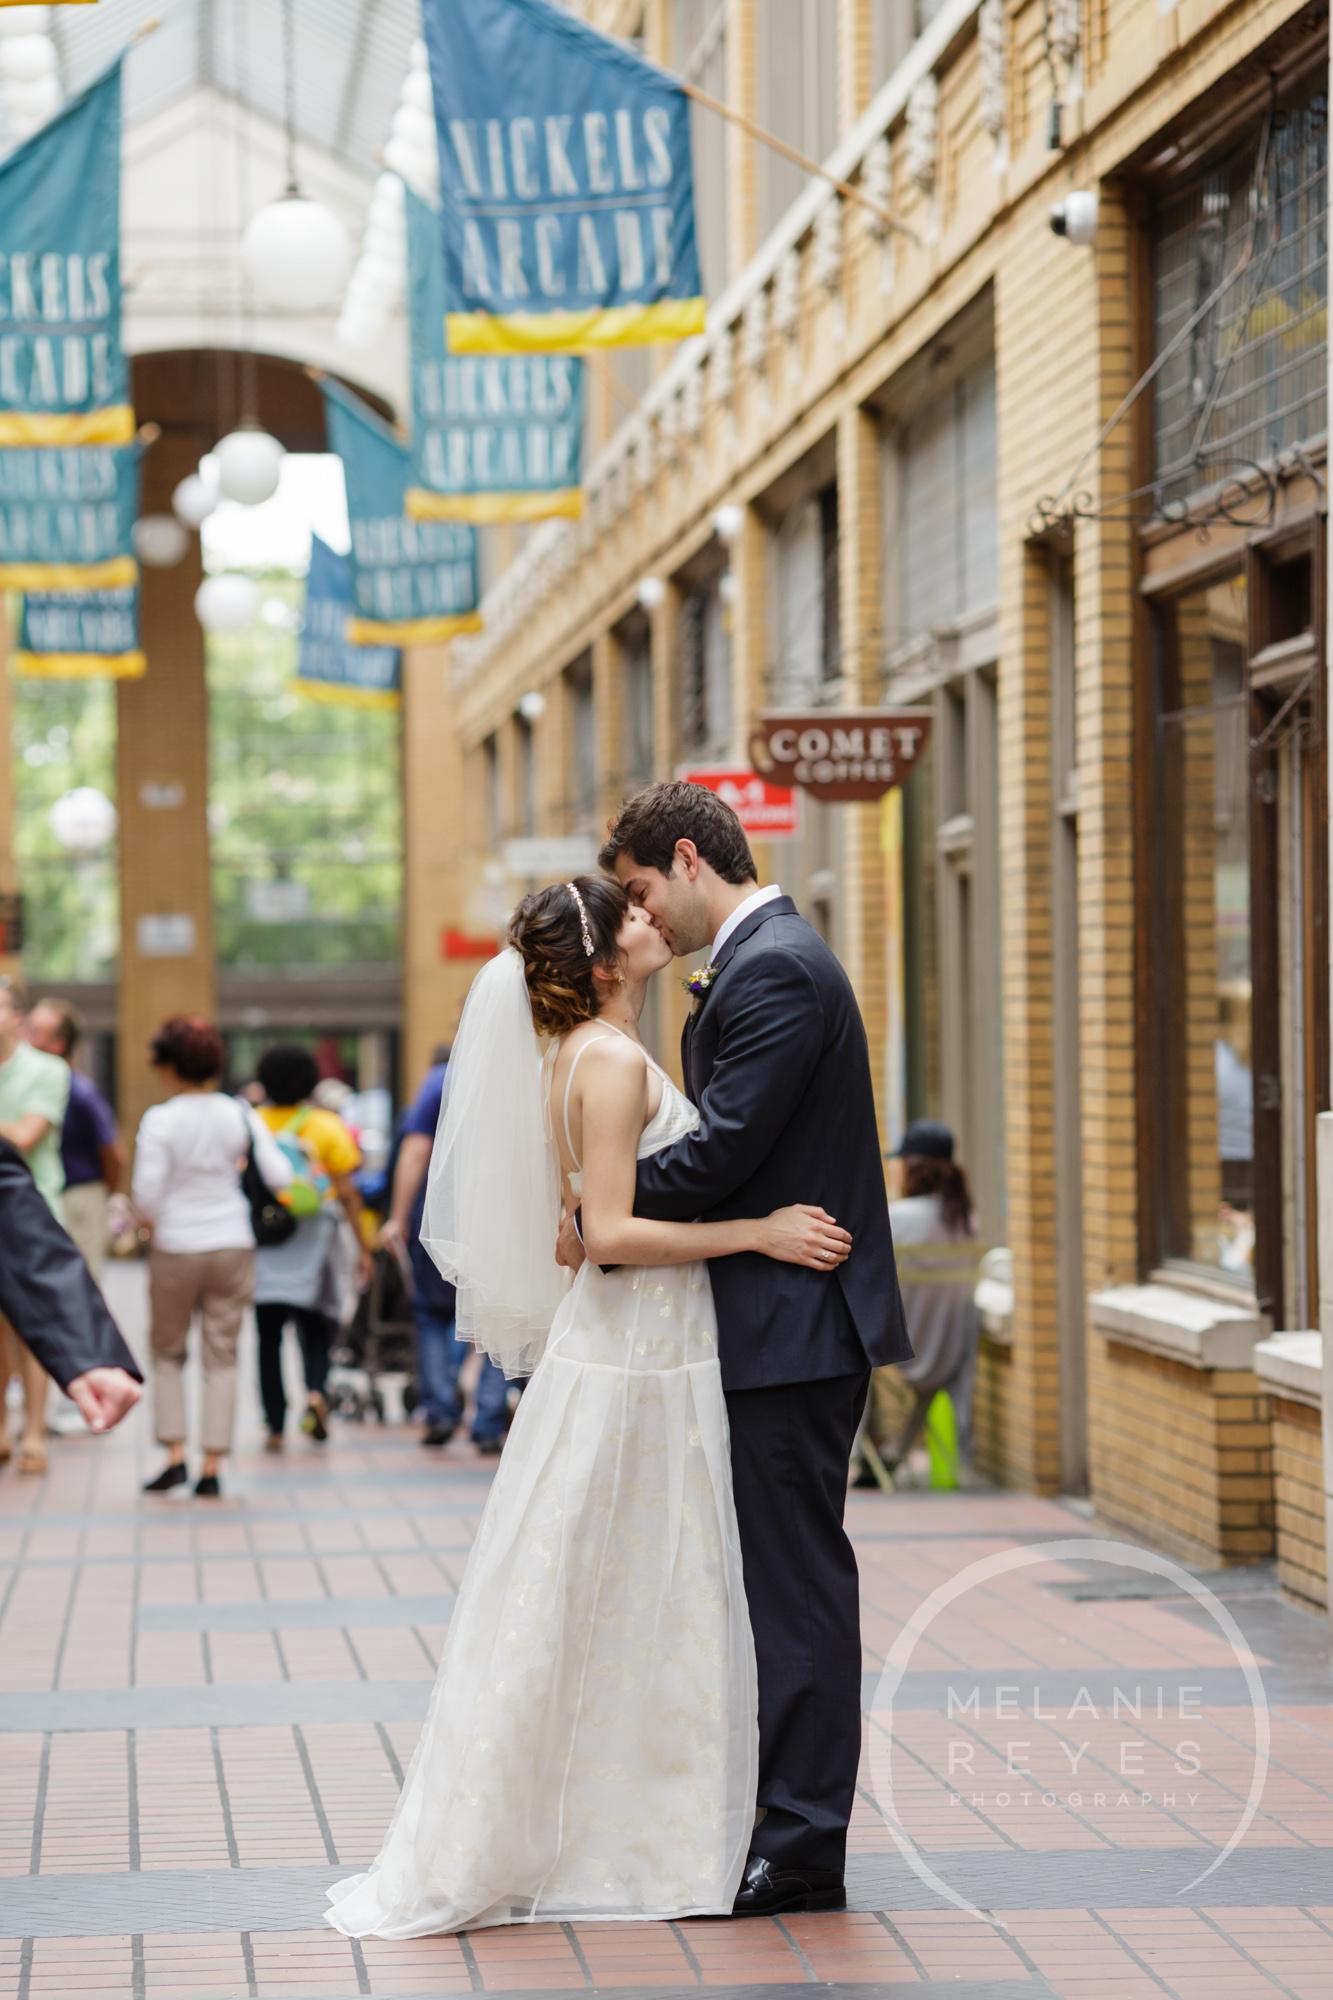 carlylewie_annarbor_wedding_-22.jpg